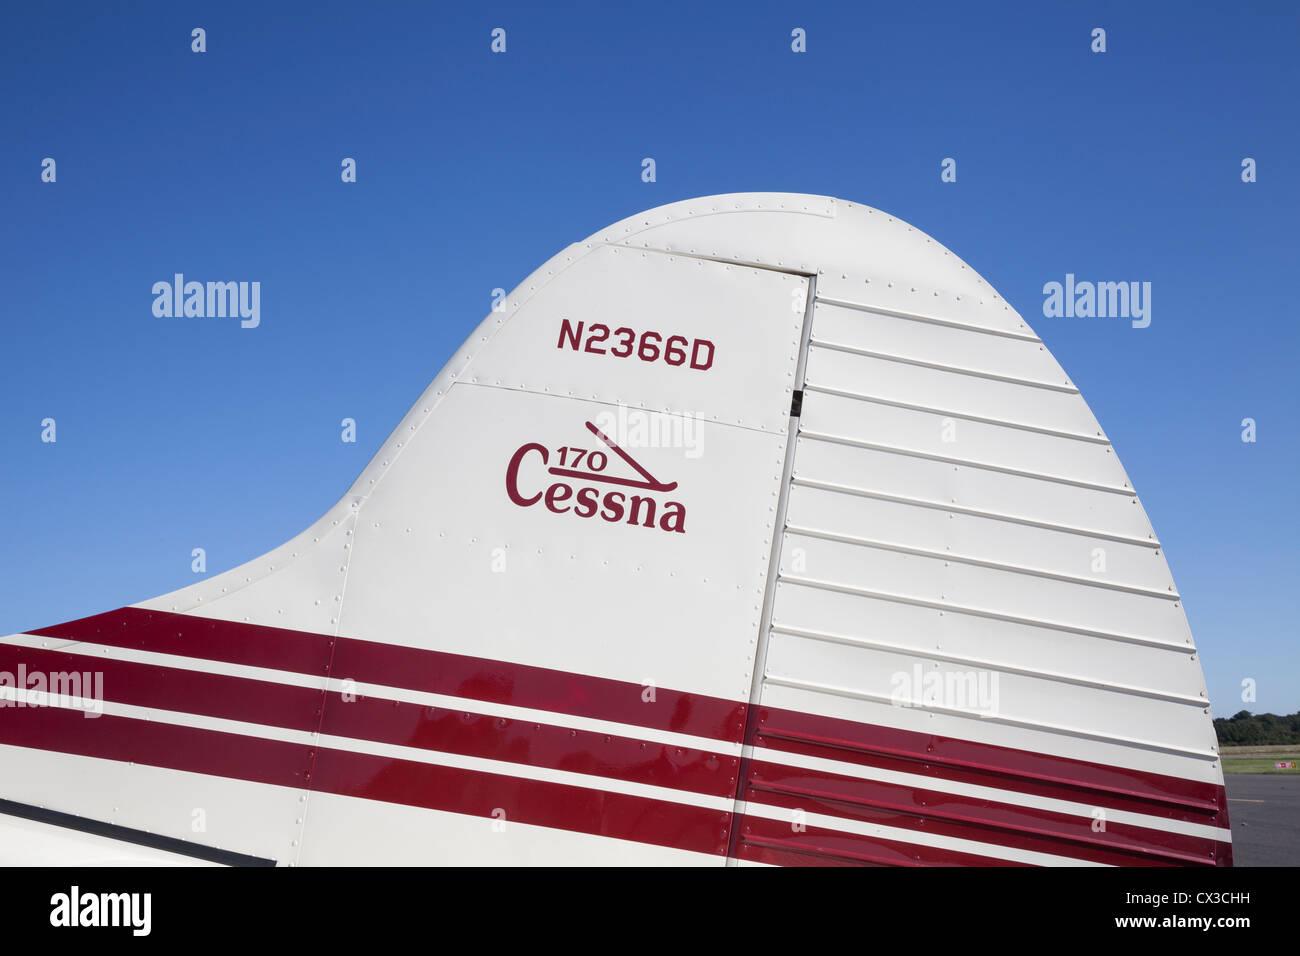 Tailplane and logo, Cessna 170 reg N2366D - Stock Image